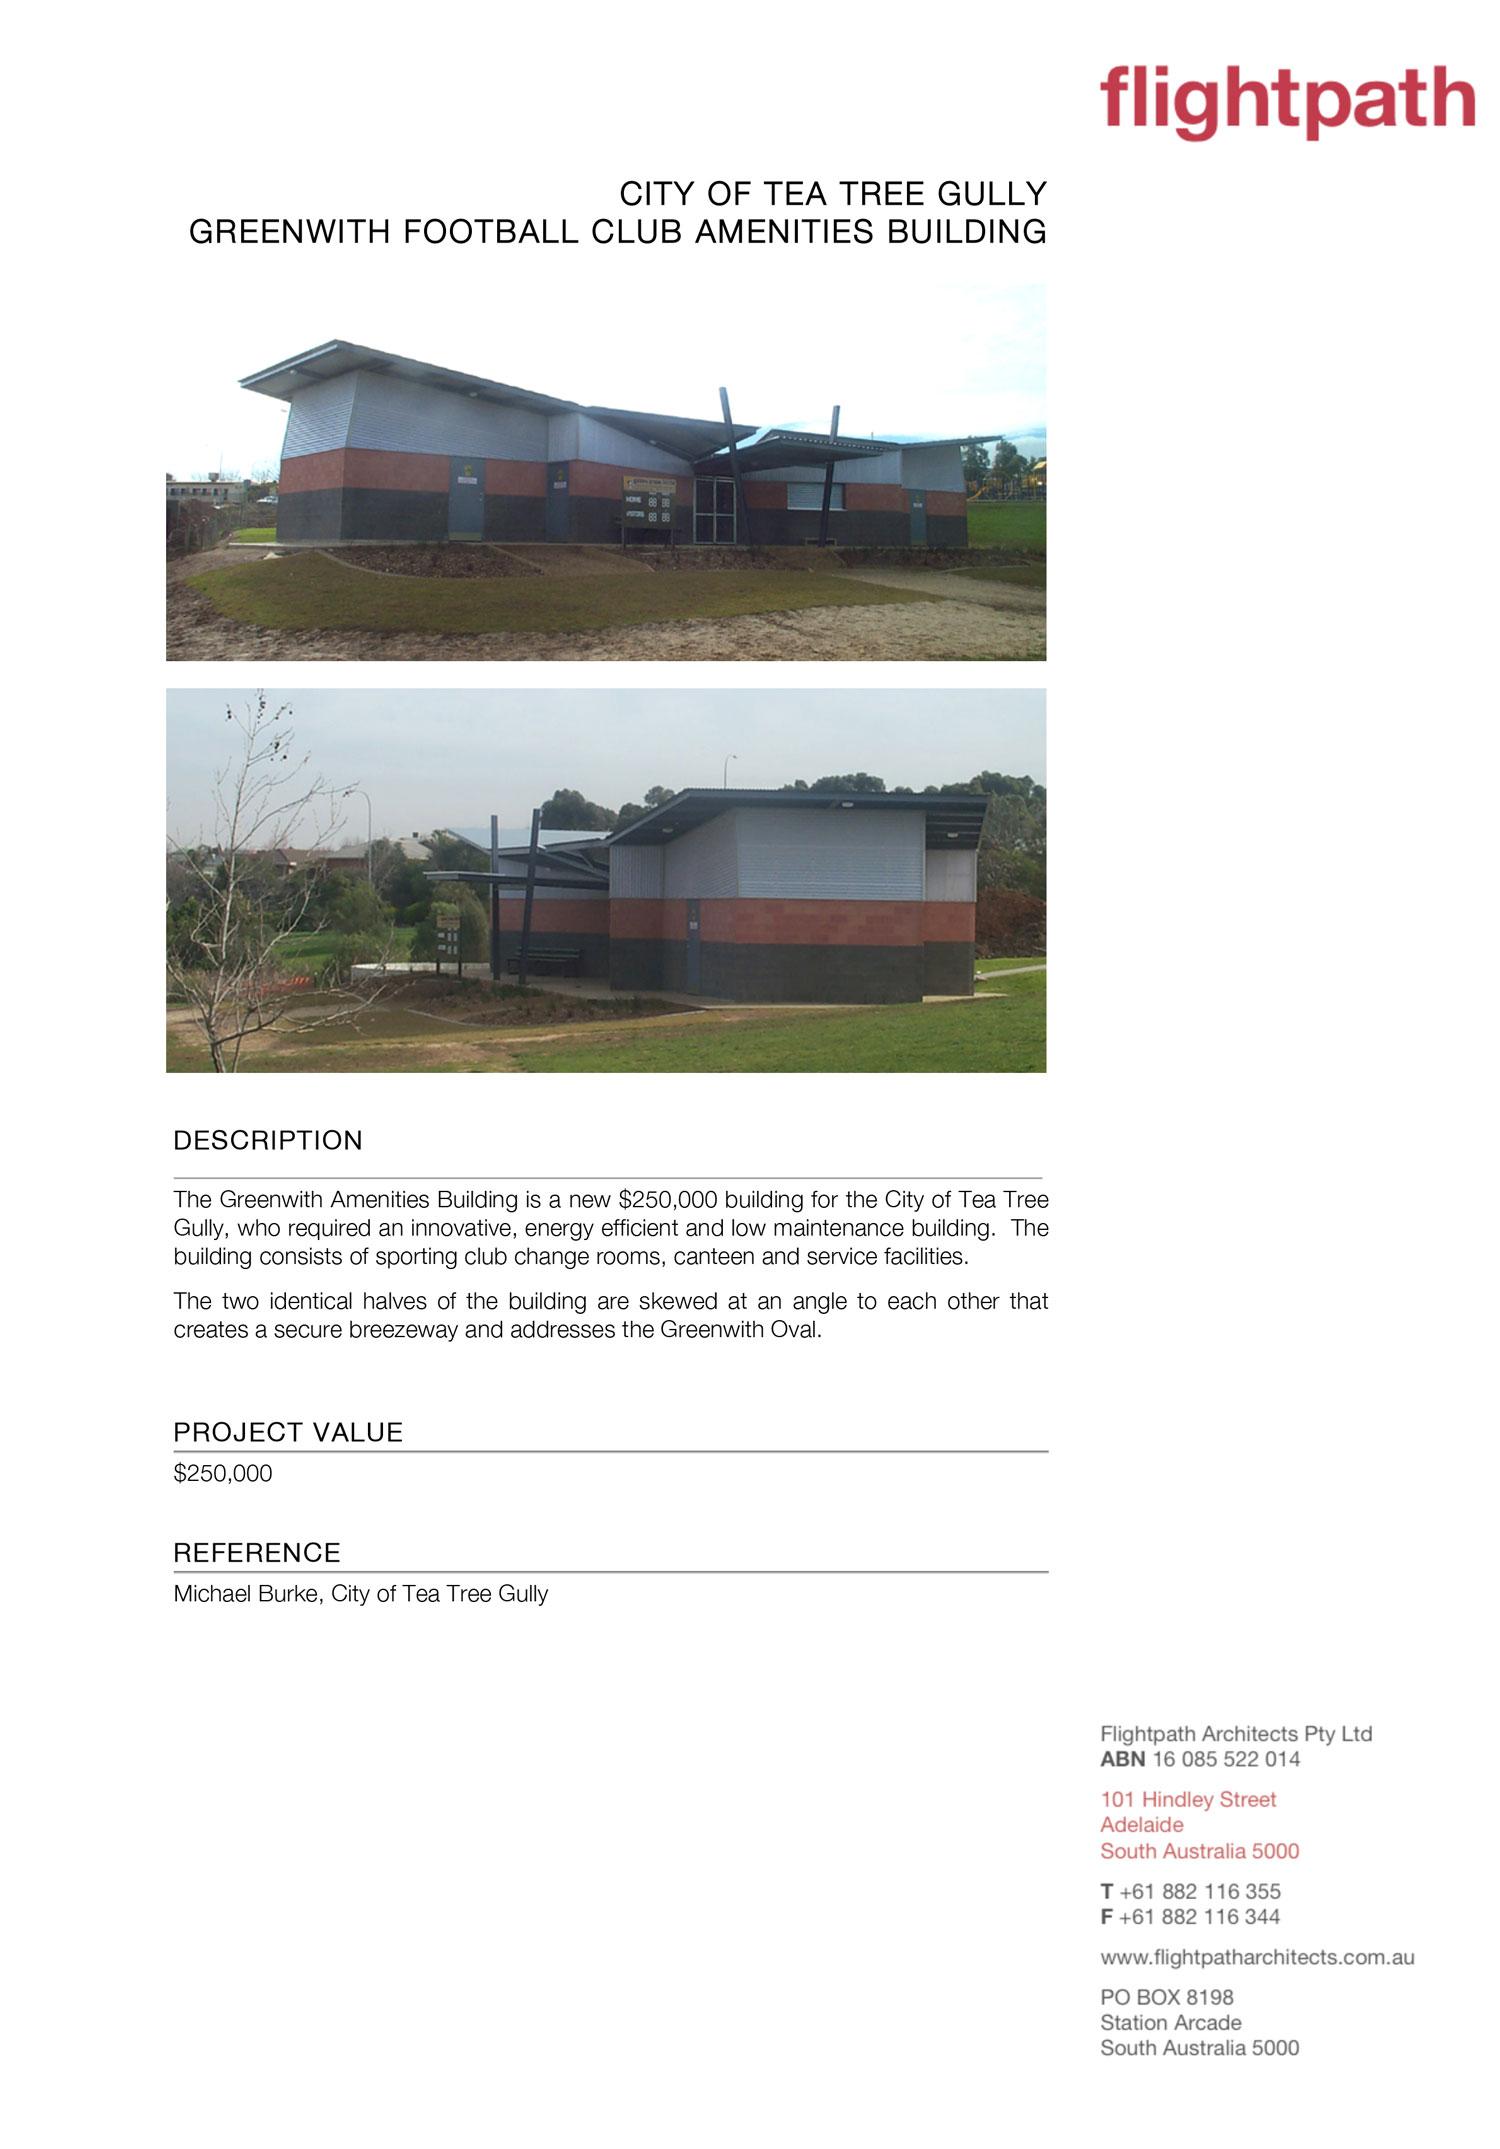 2014 Greenwith-Football-Club-Amenities-Building-2014.jpg